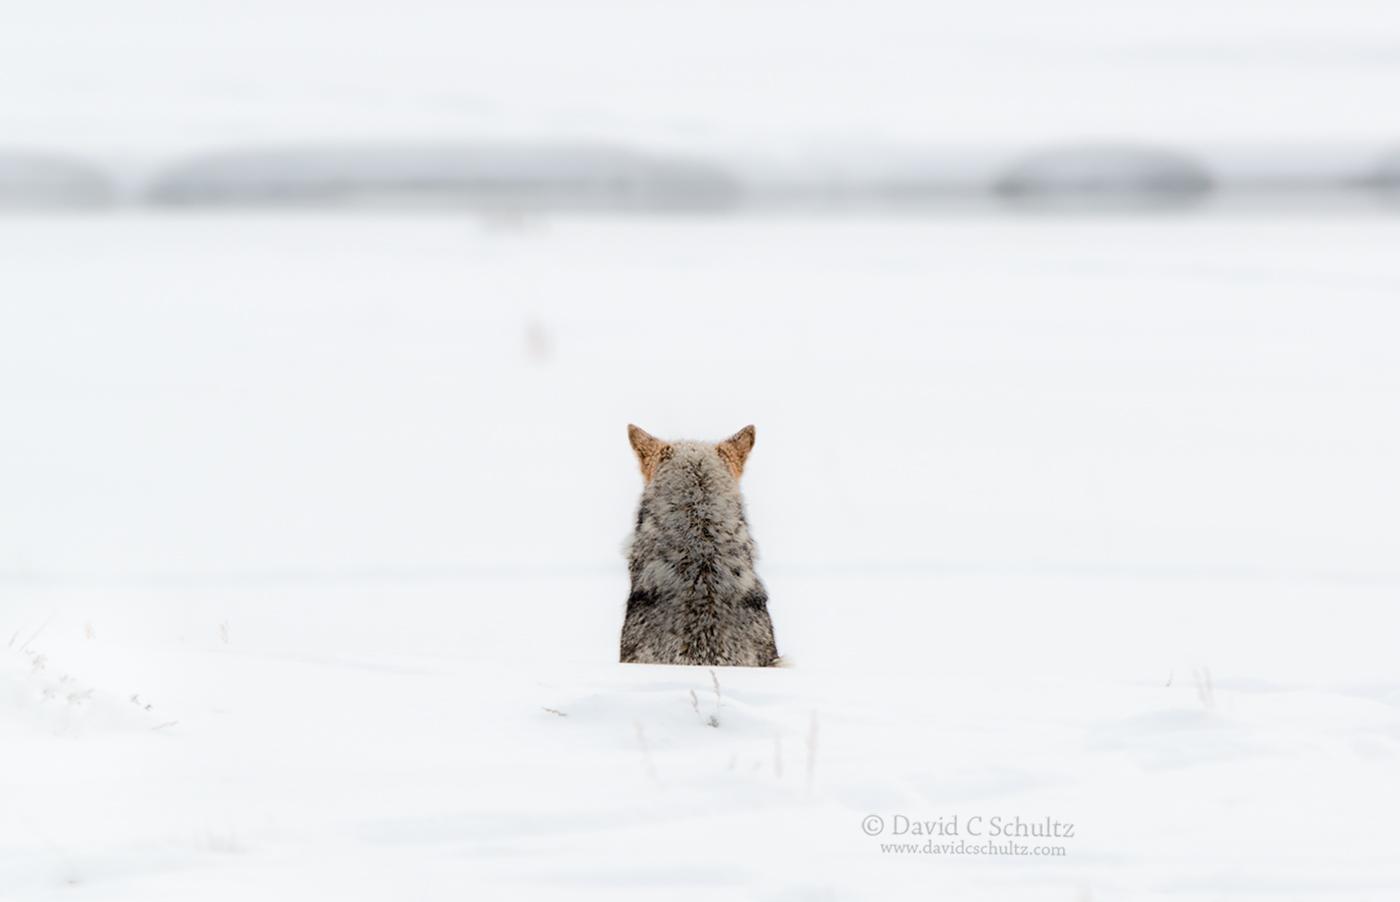 coyote-winter-yellowstone-161-3120